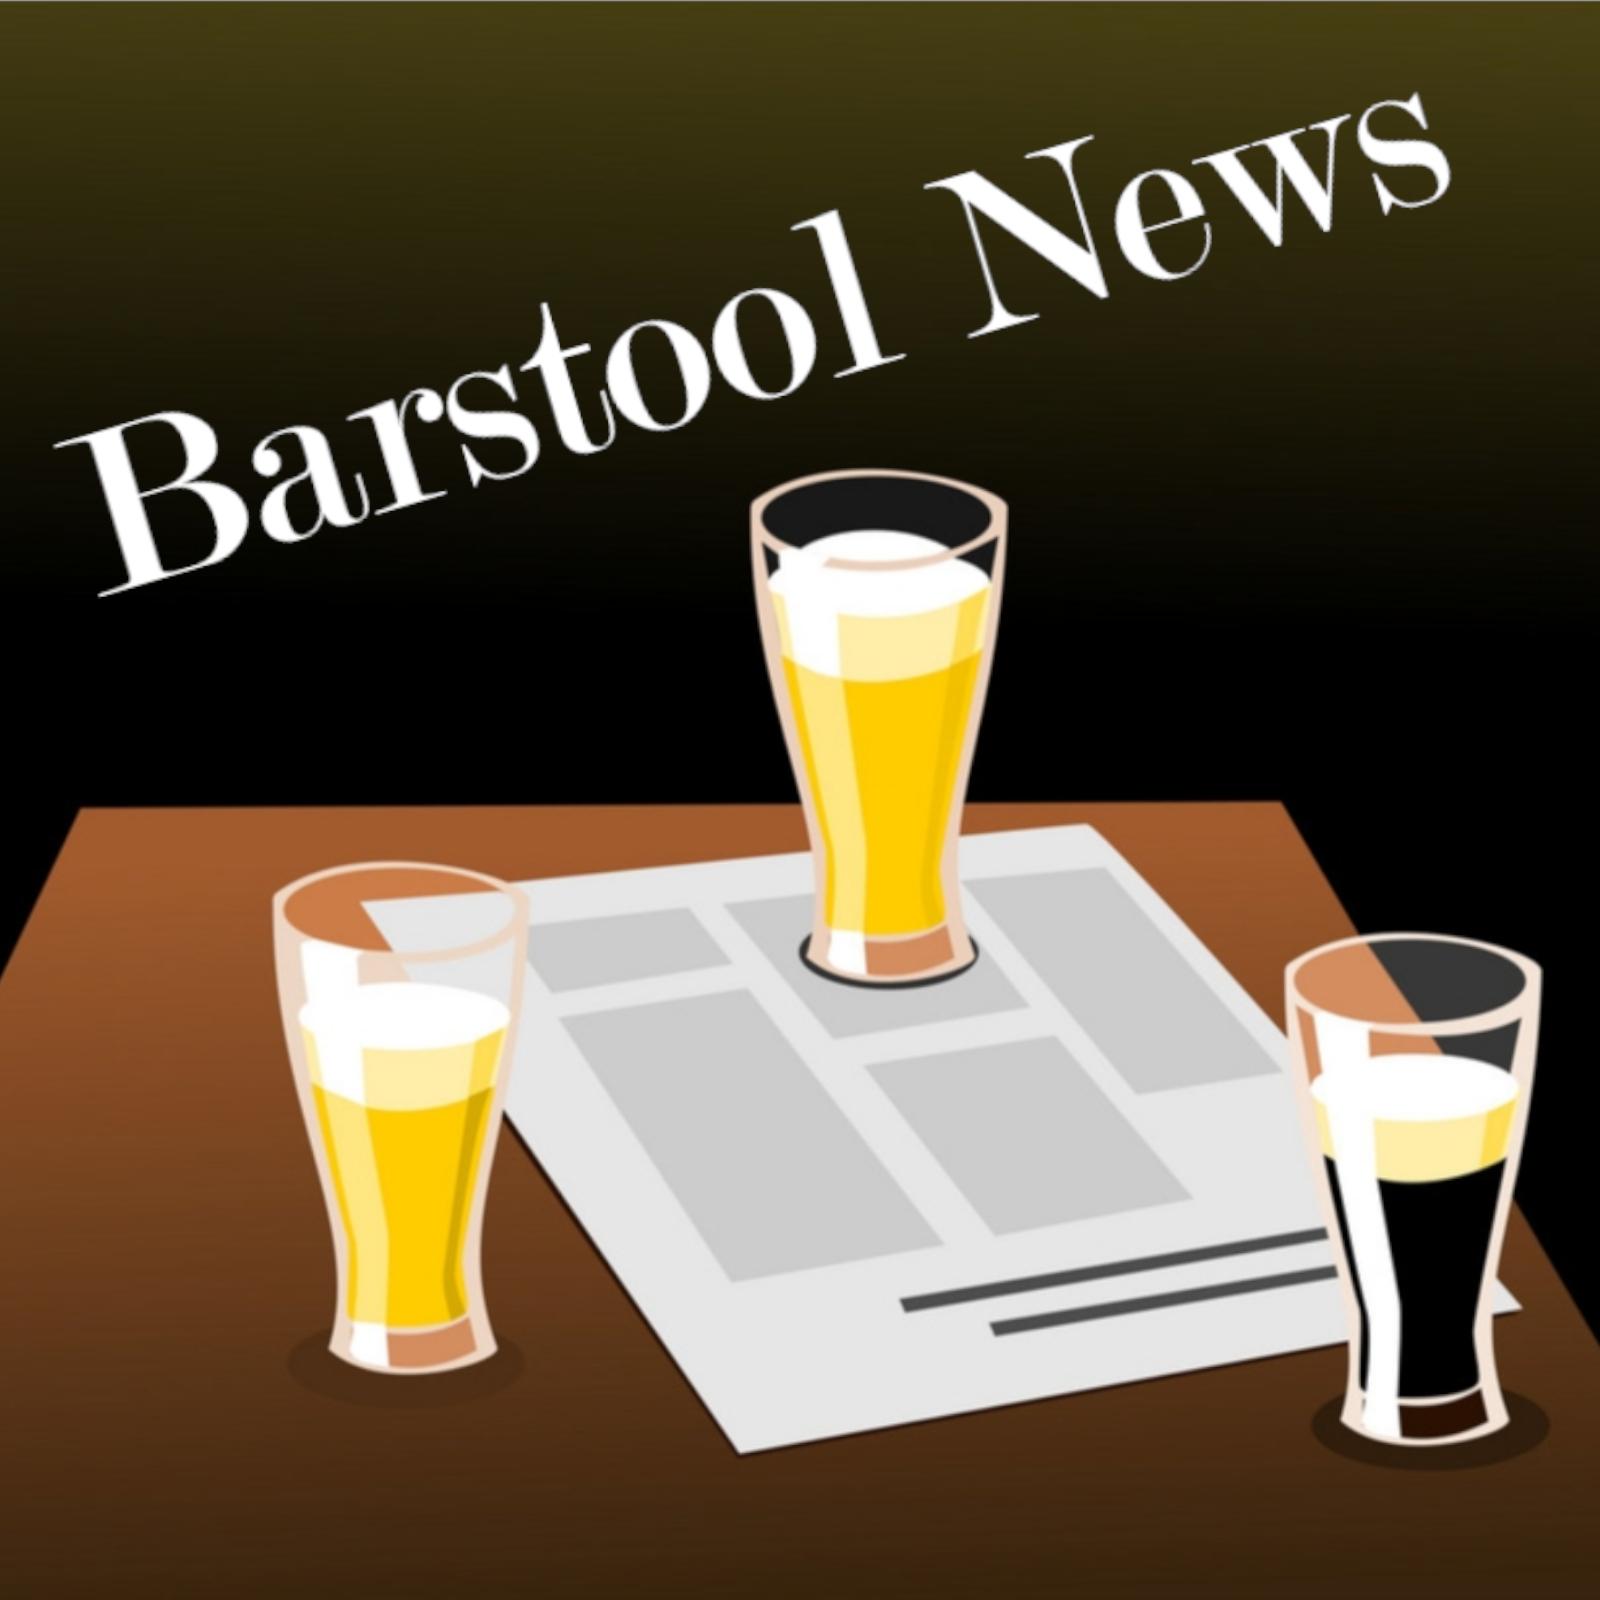 Show artwork for Barstool News